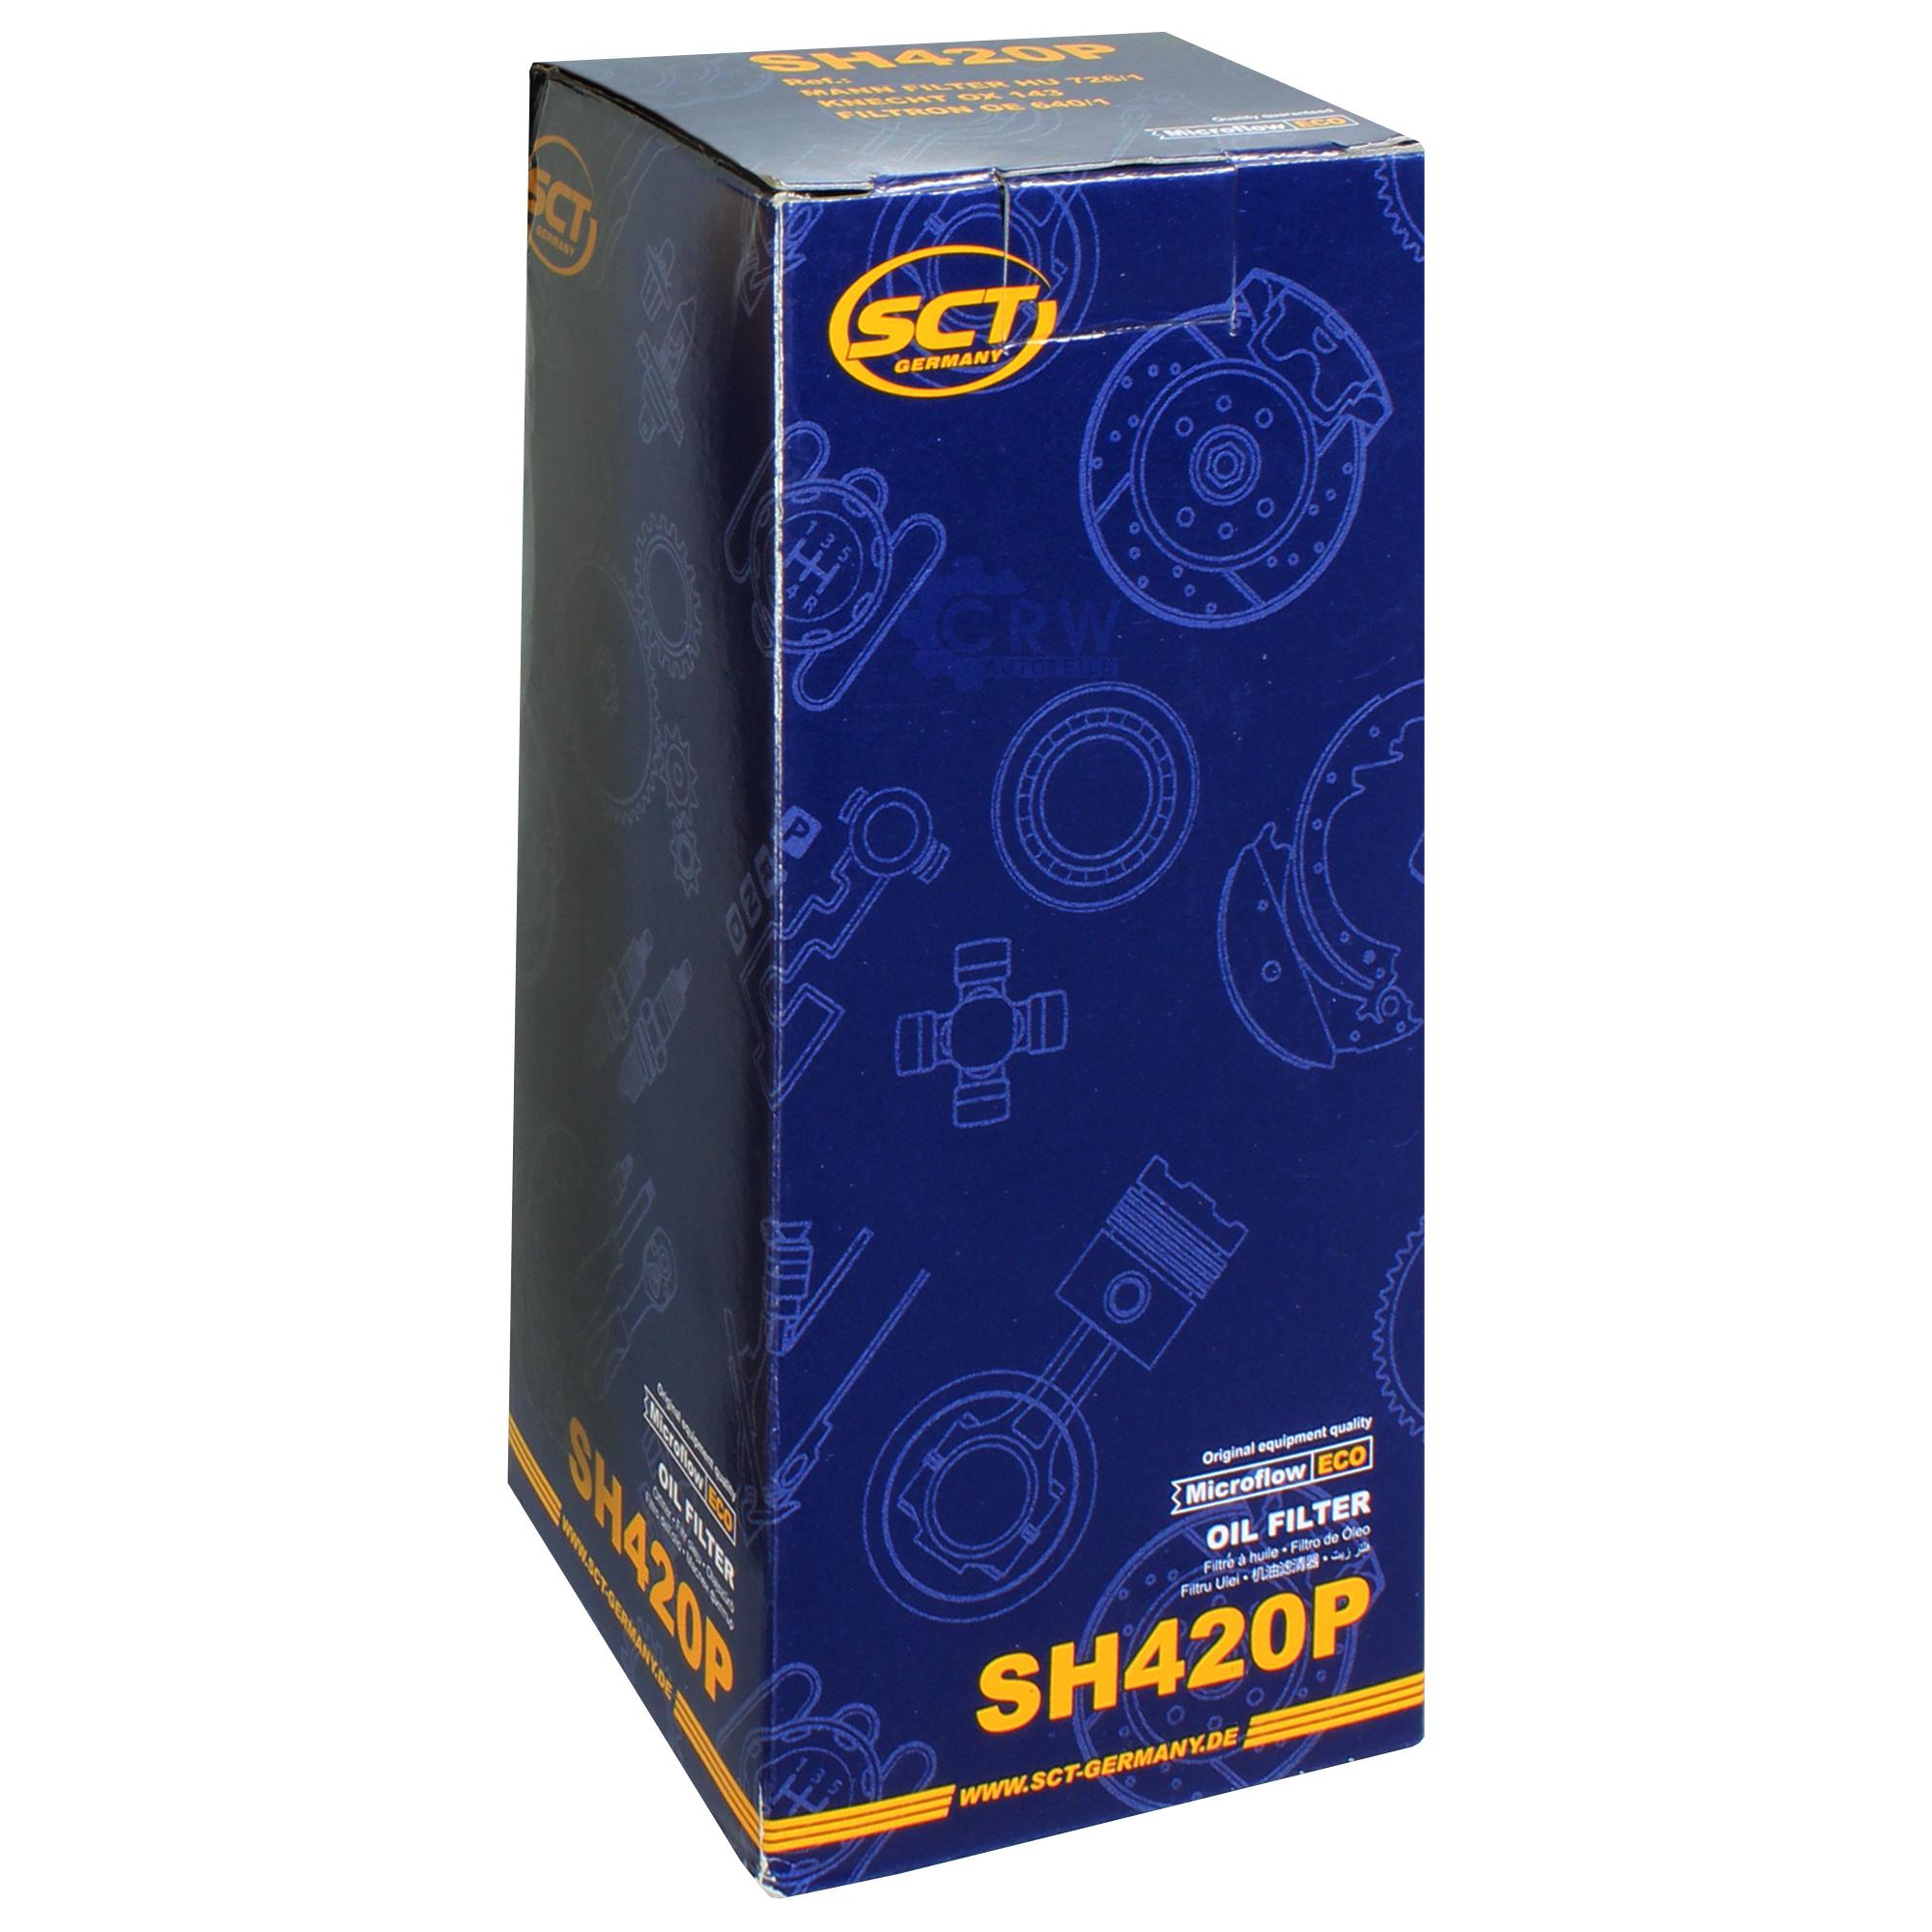 Cambio-de-aceite-set-5l-MANNOL-energy-premium-5w-30-sct-filtro-aceite-Service-10164411 miniatura 4